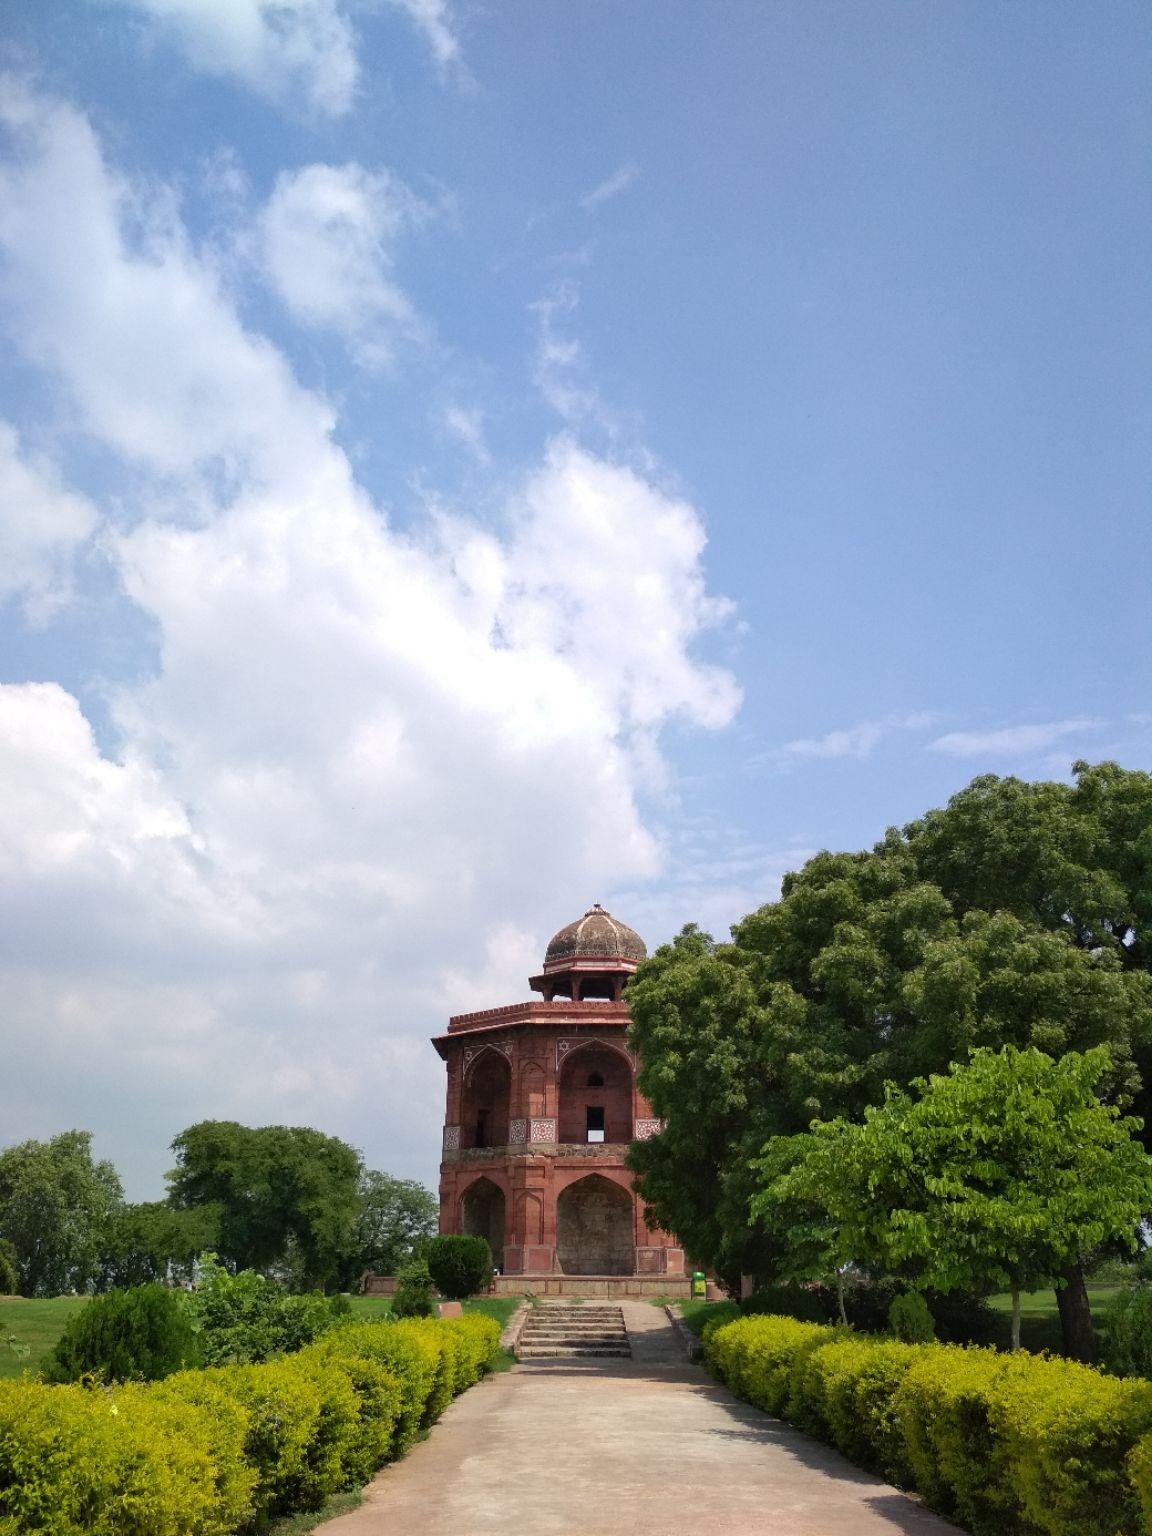 Photo of Purana Qila By Tanvi Diwan